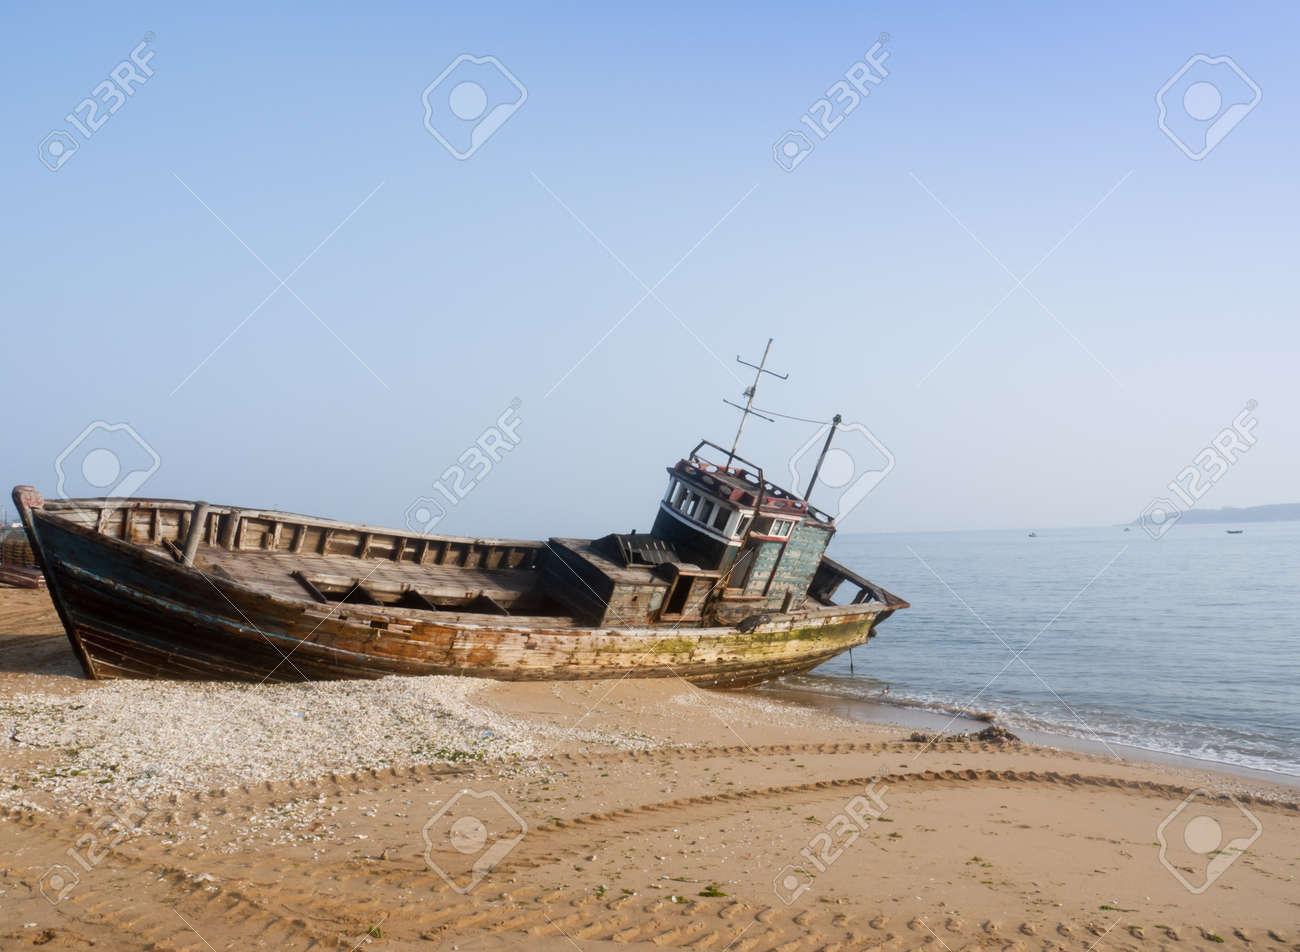 Rusty ship at the beach Stock Photo - 11552181